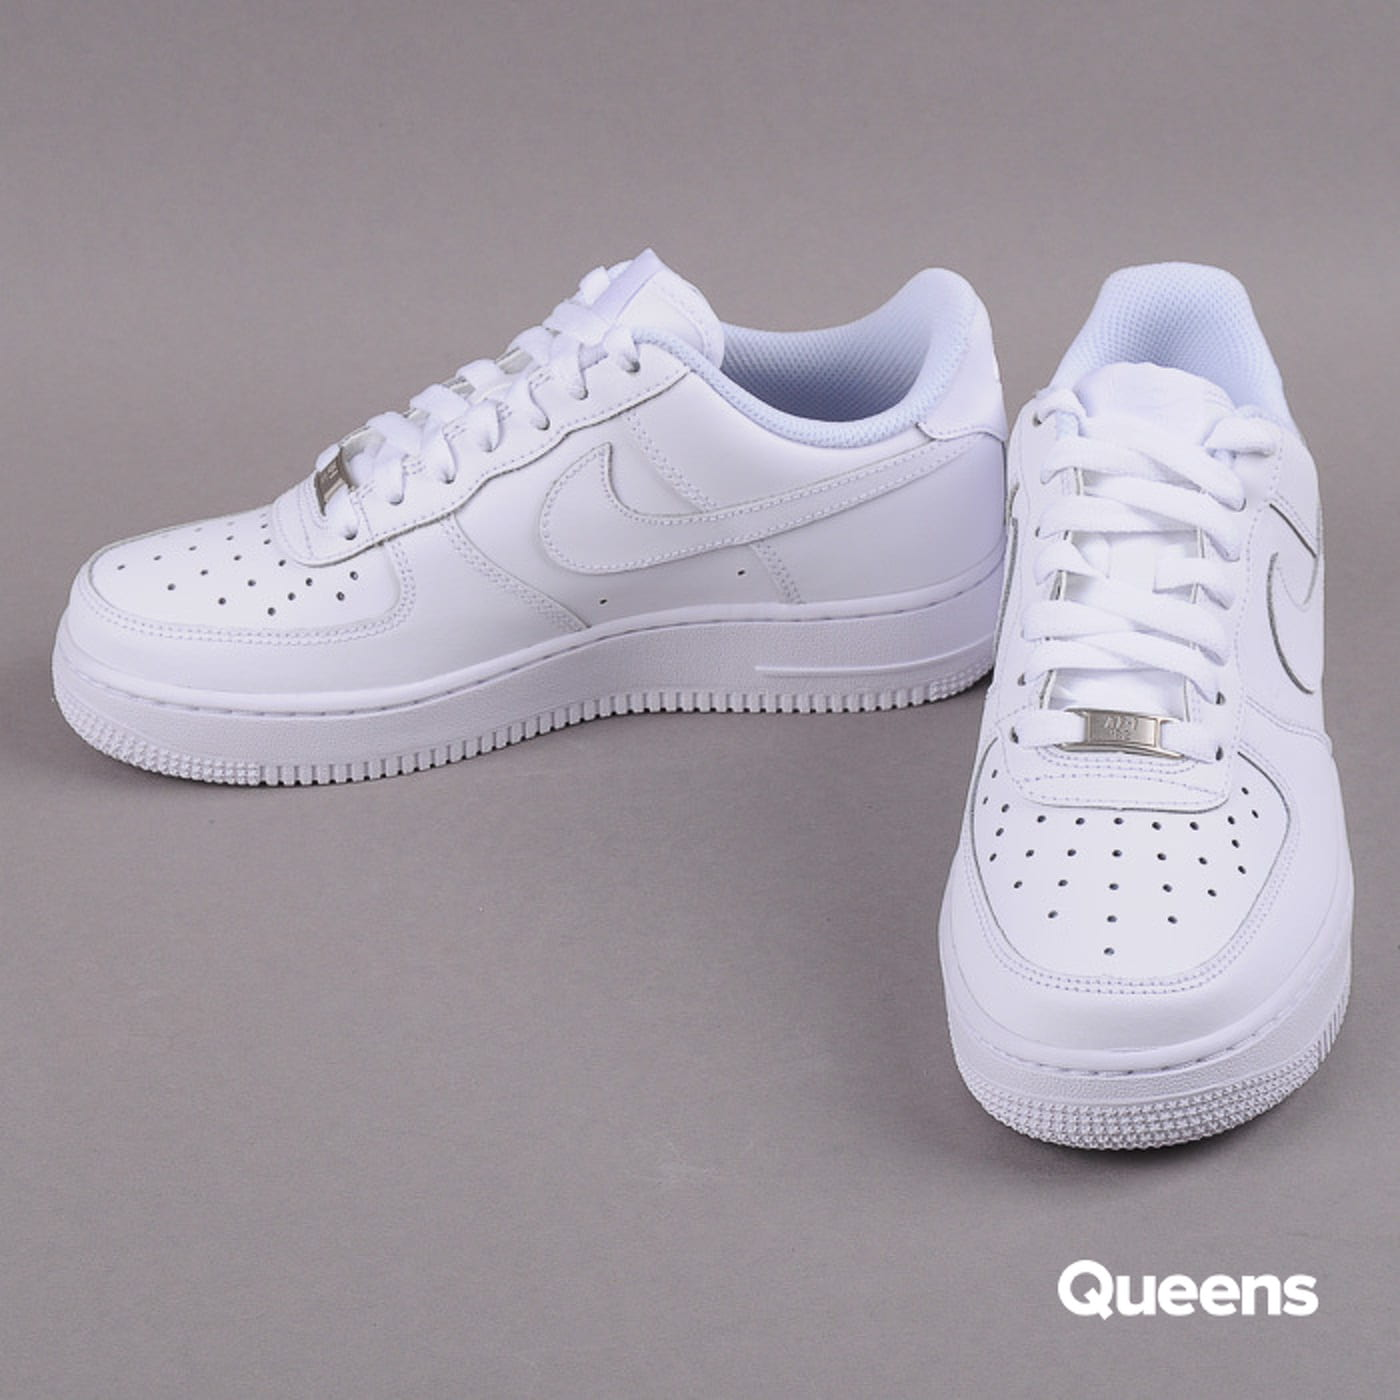 Nike WMNS Air Force 1 '07 white / white